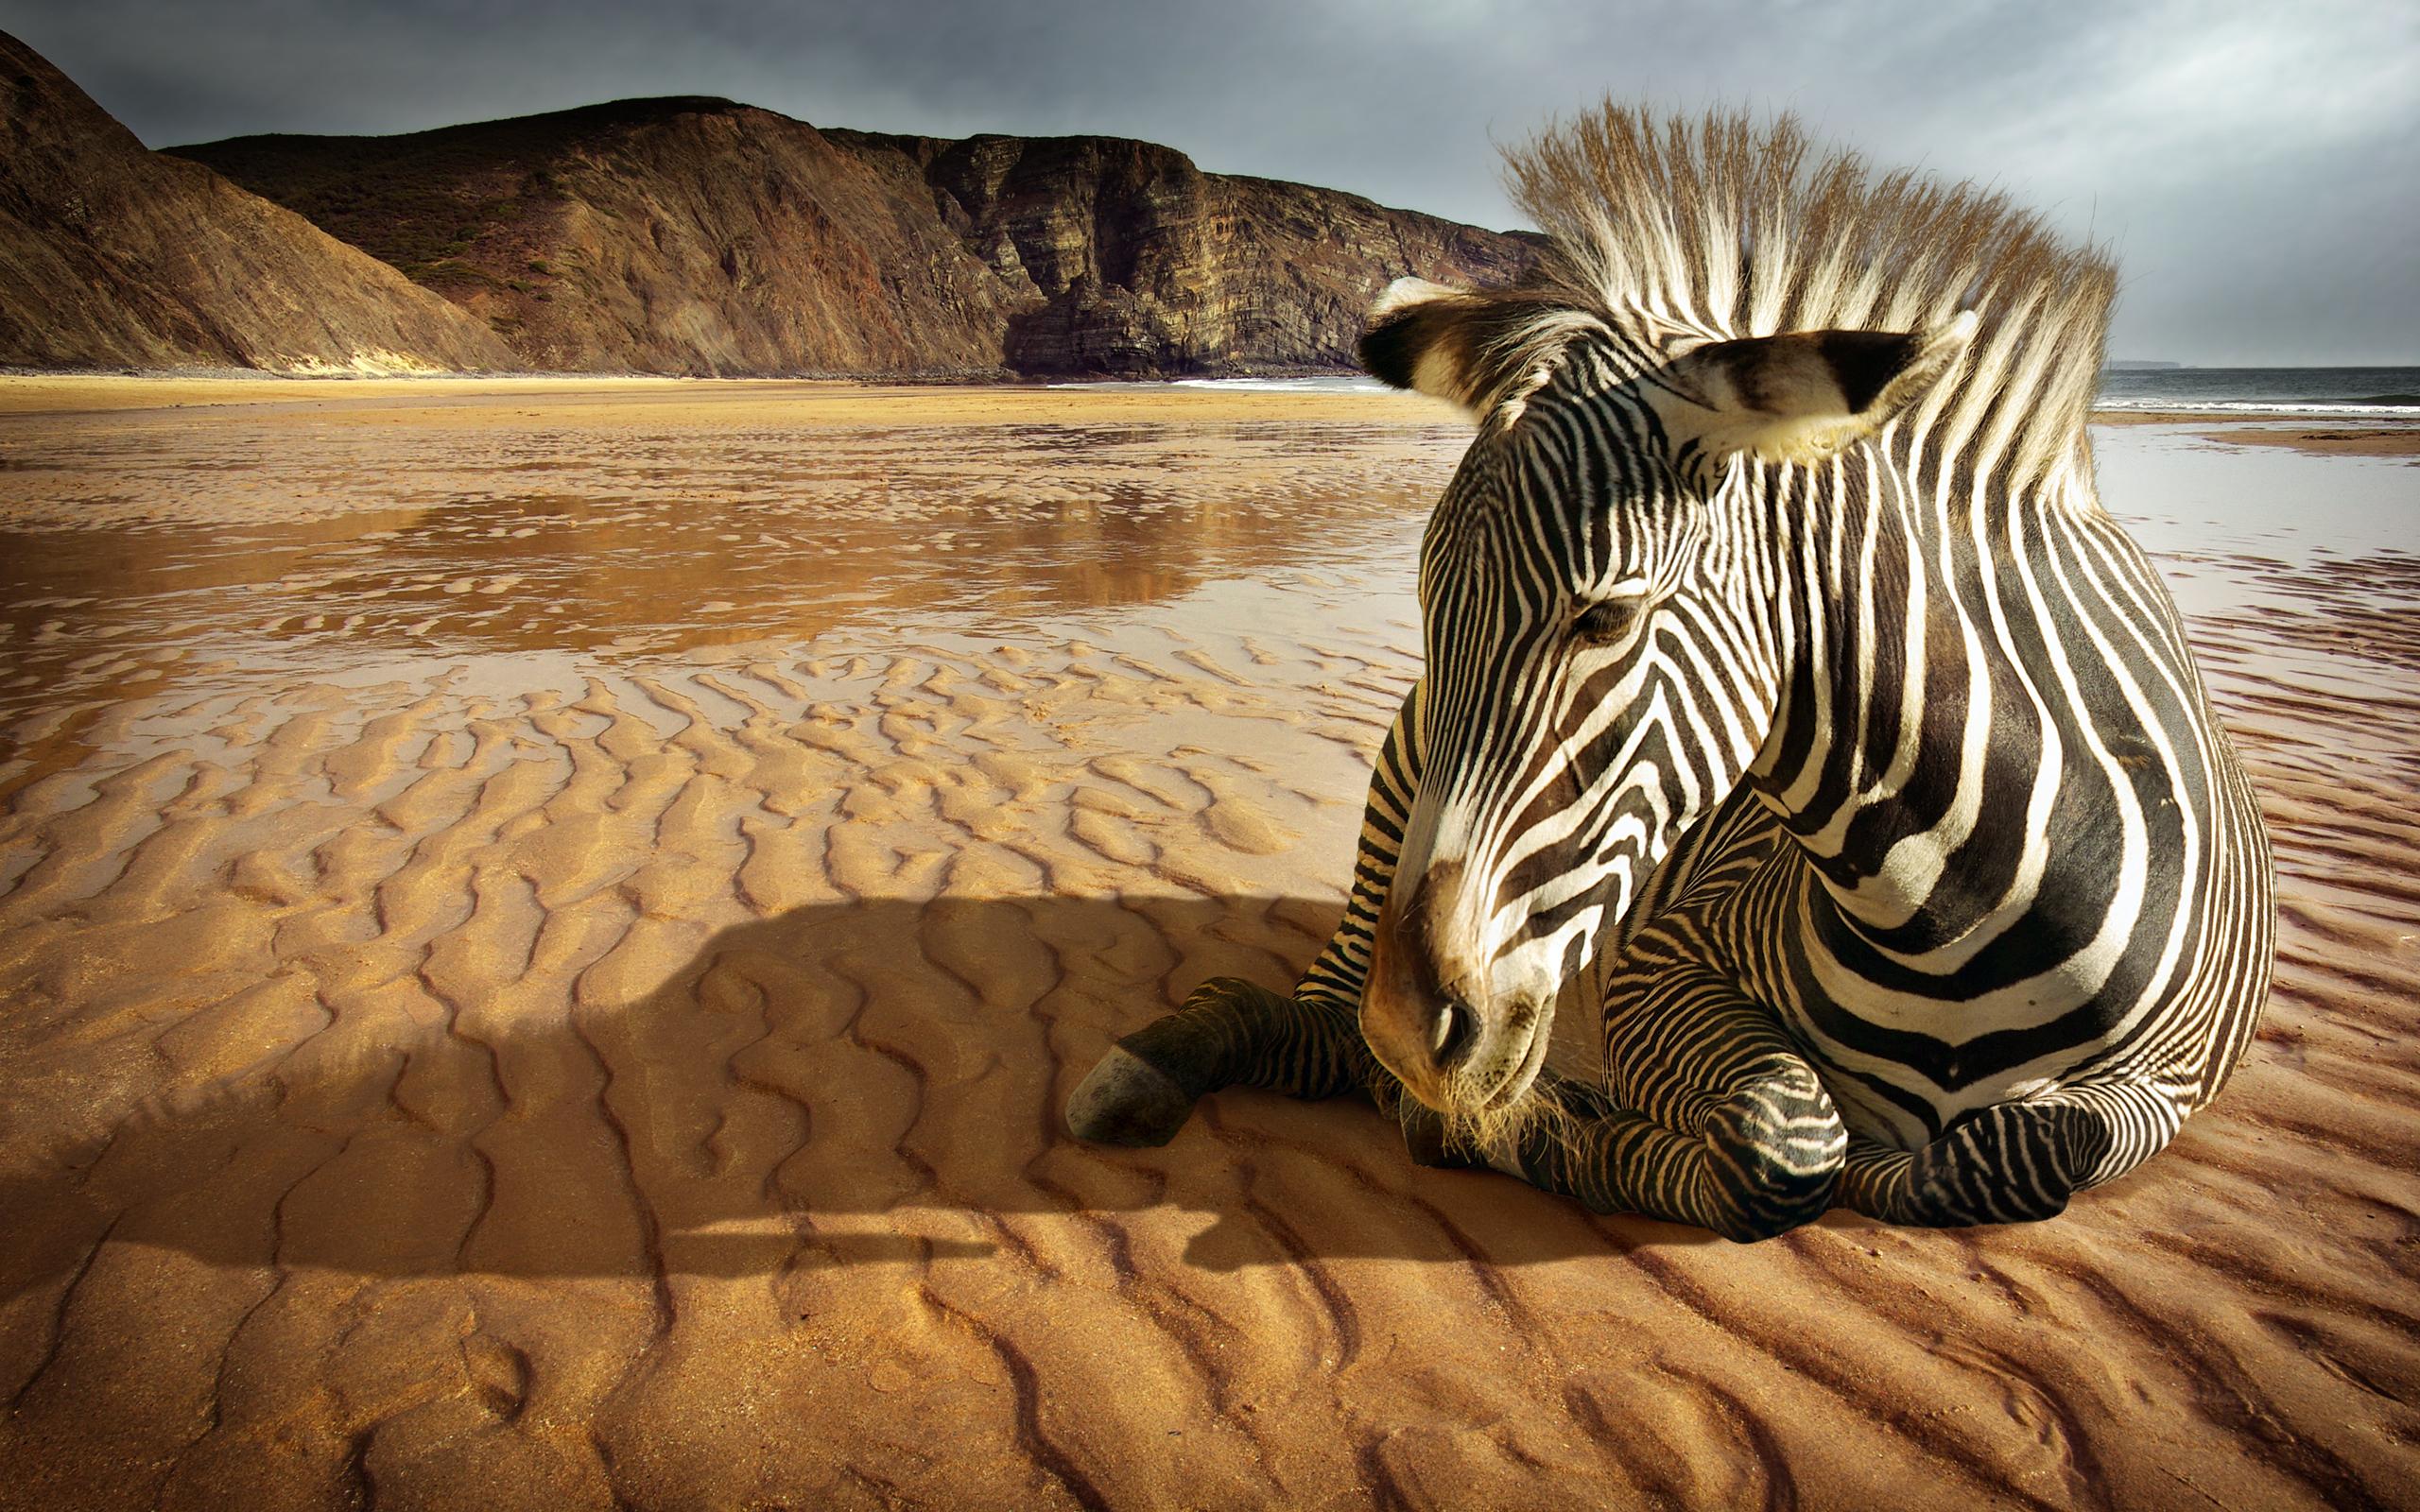 hd wallpaper background id351449 2560x1600 animal zebra